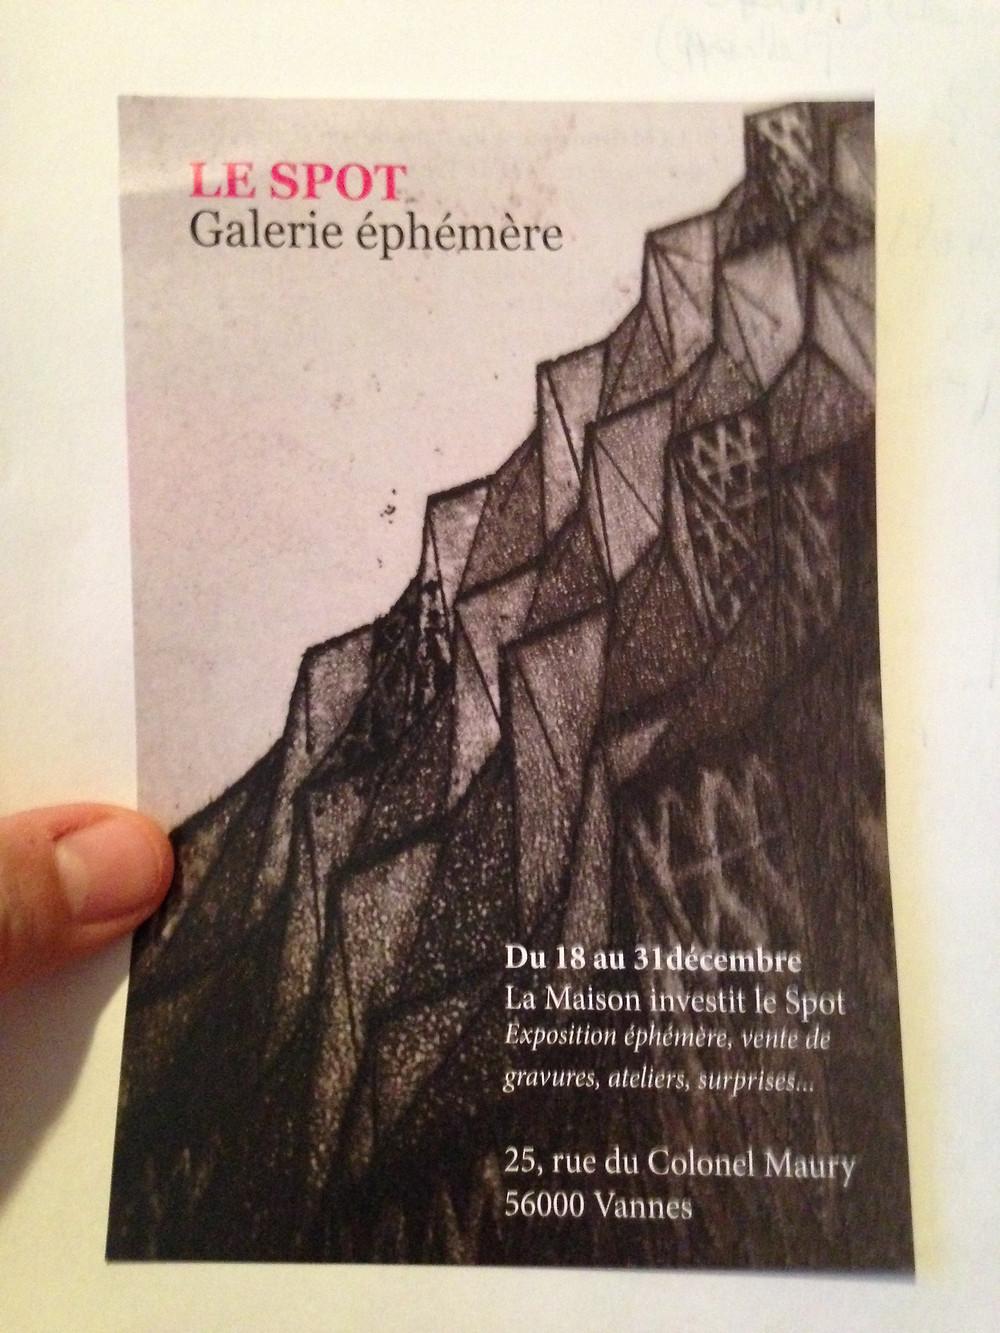 Le Spot- Galerie ephemere in Vannes